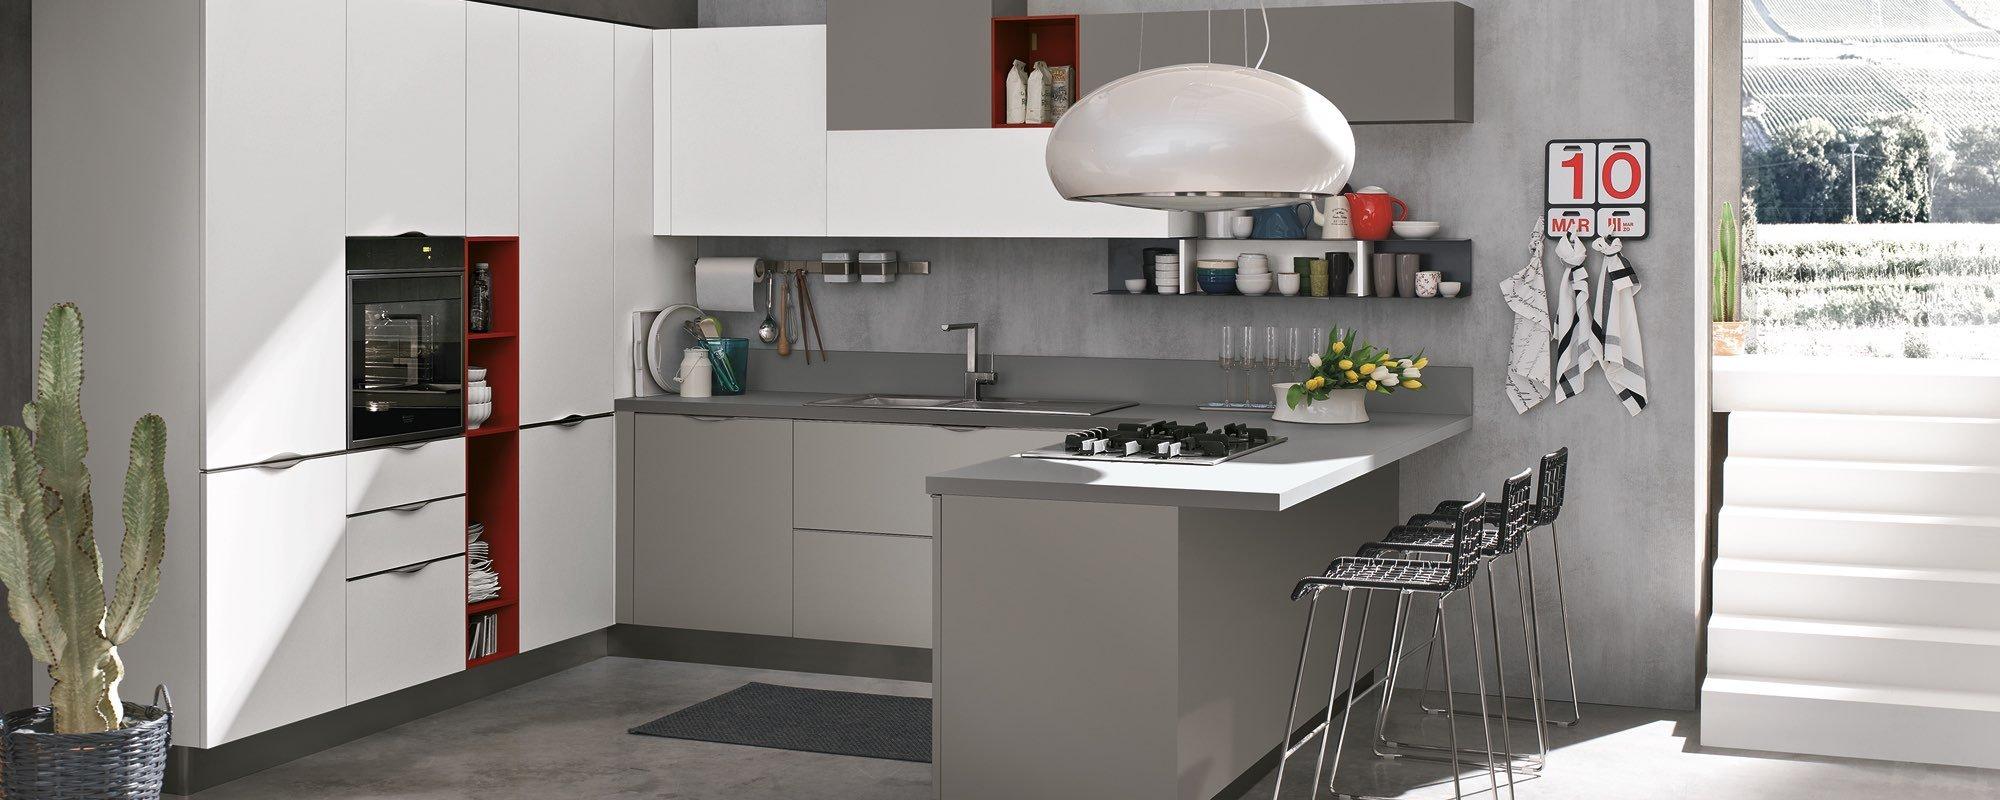 Cucina Stosa Bring | Nuovo Arredo Cucine - Idee Di Design ...